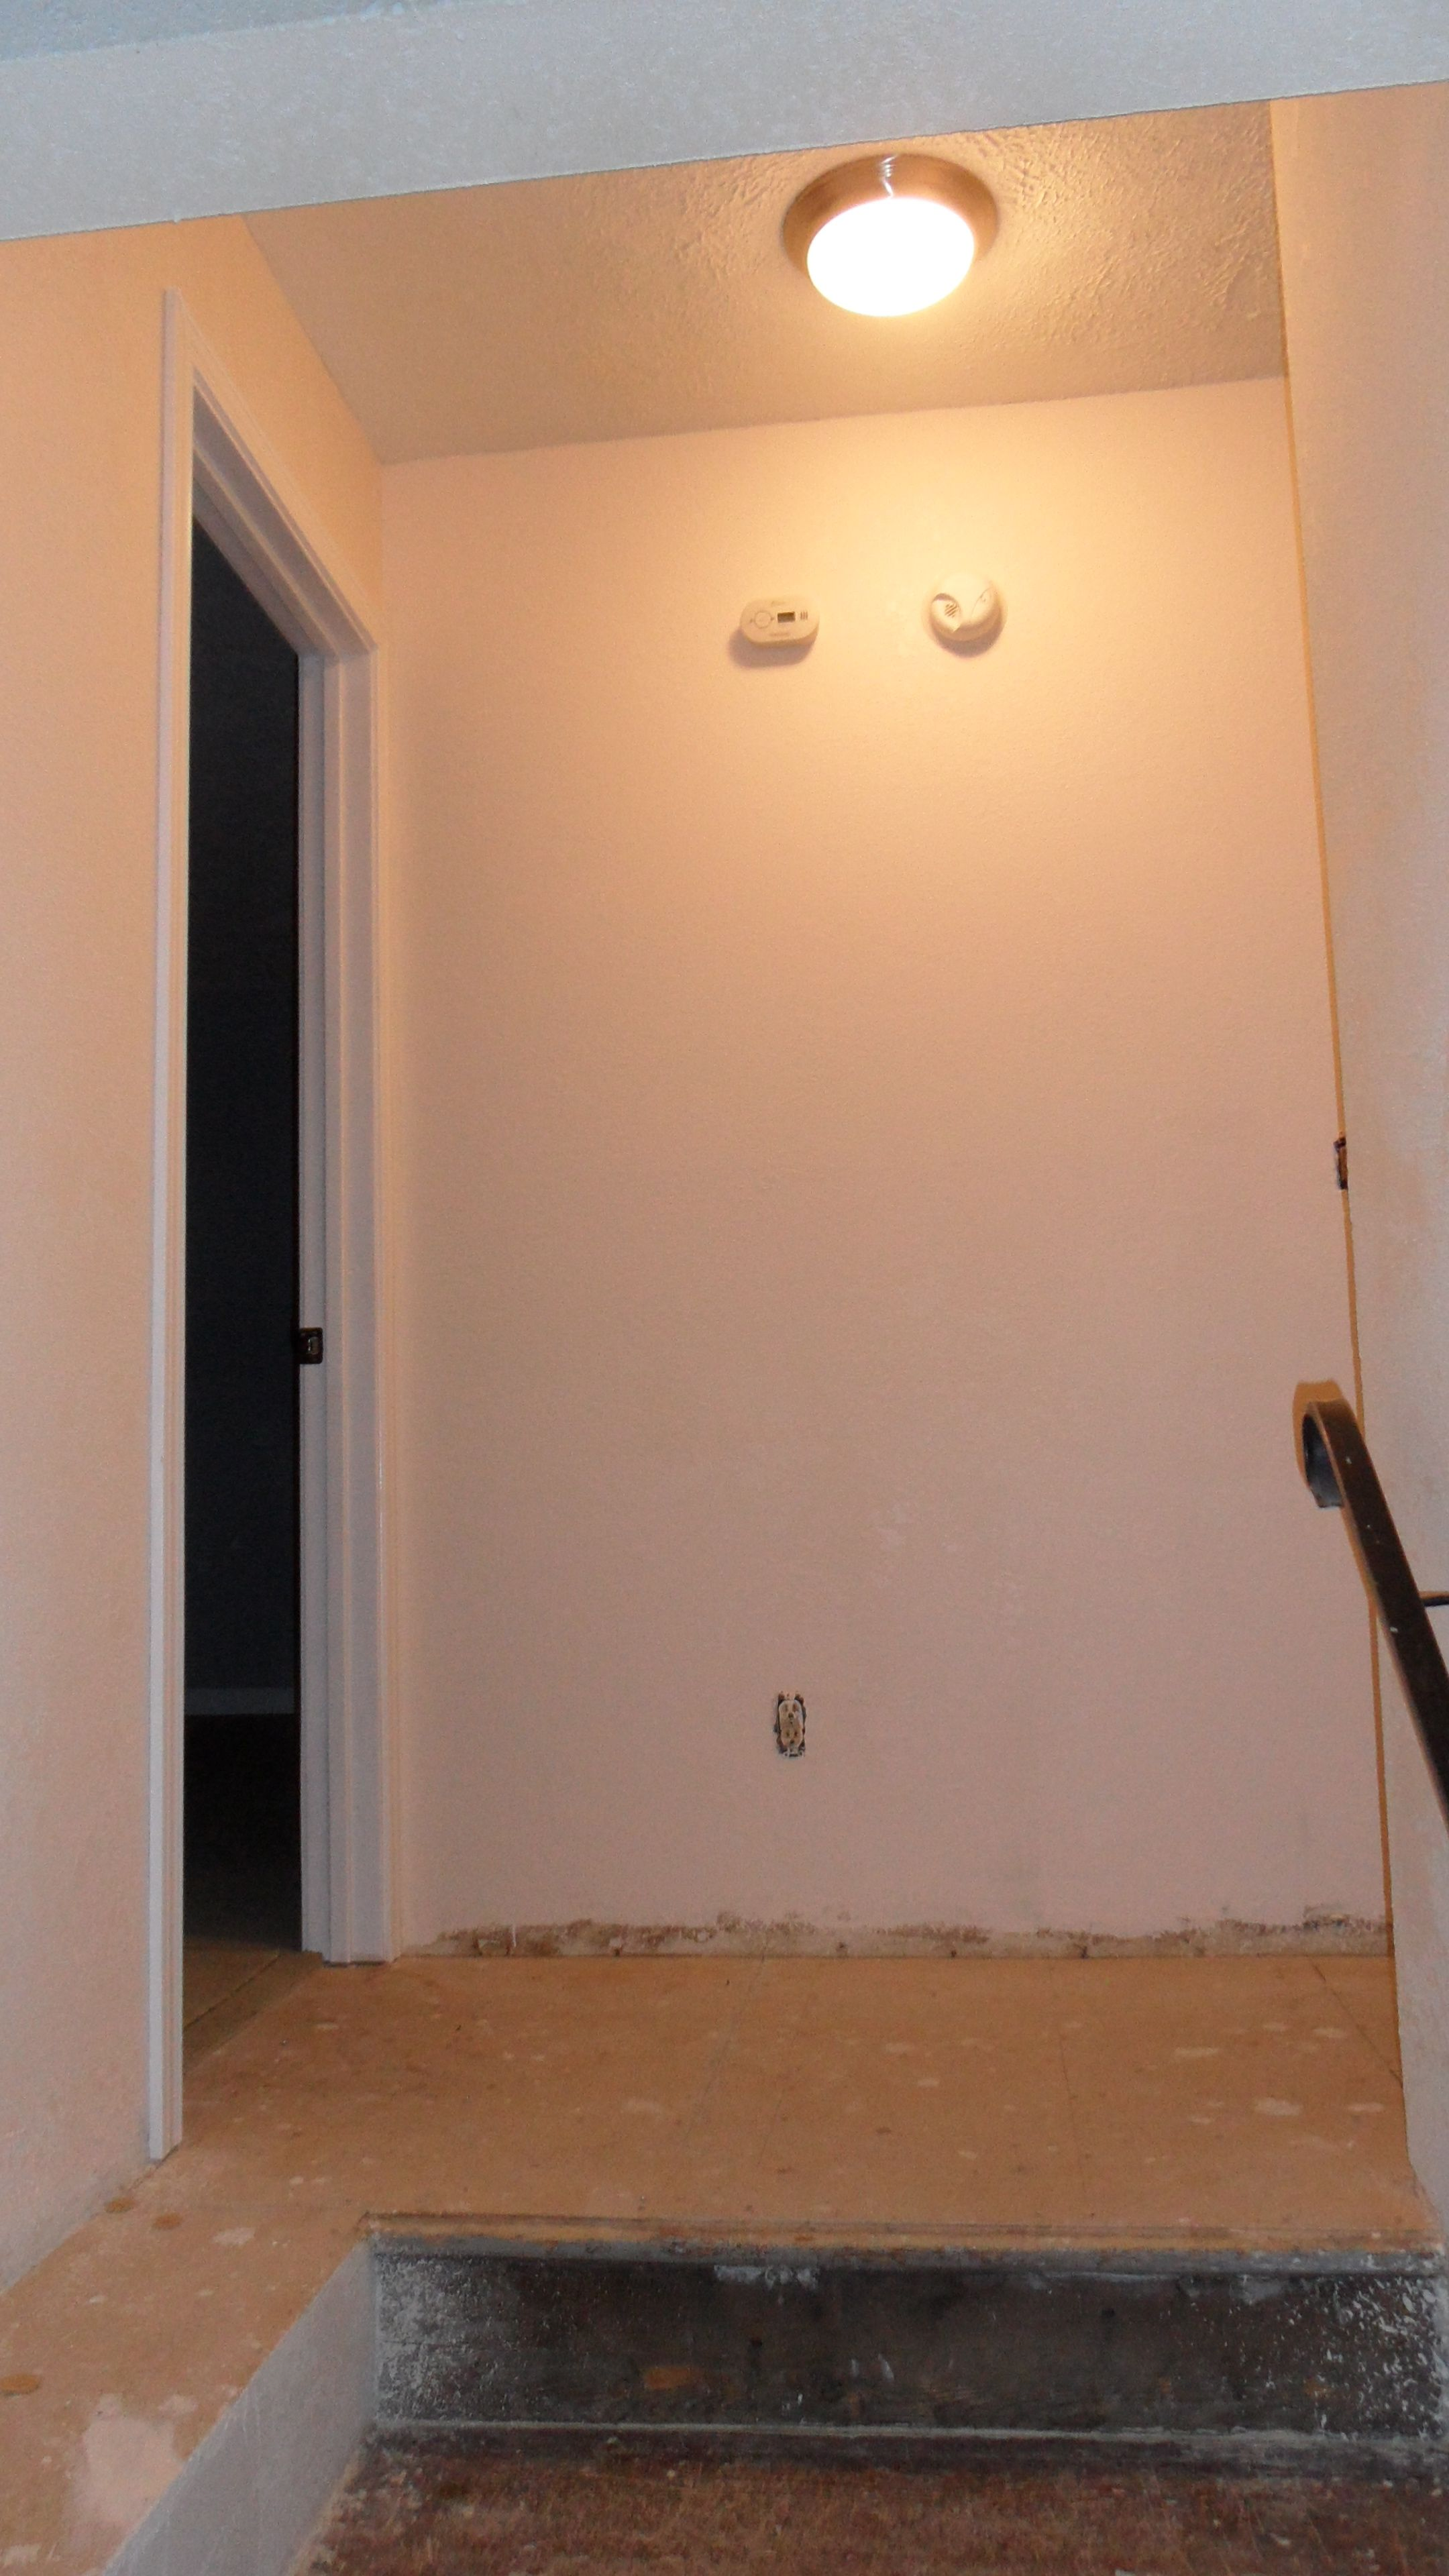 Textured Hallway W New Light Smoke Detector Carbon Monoxide